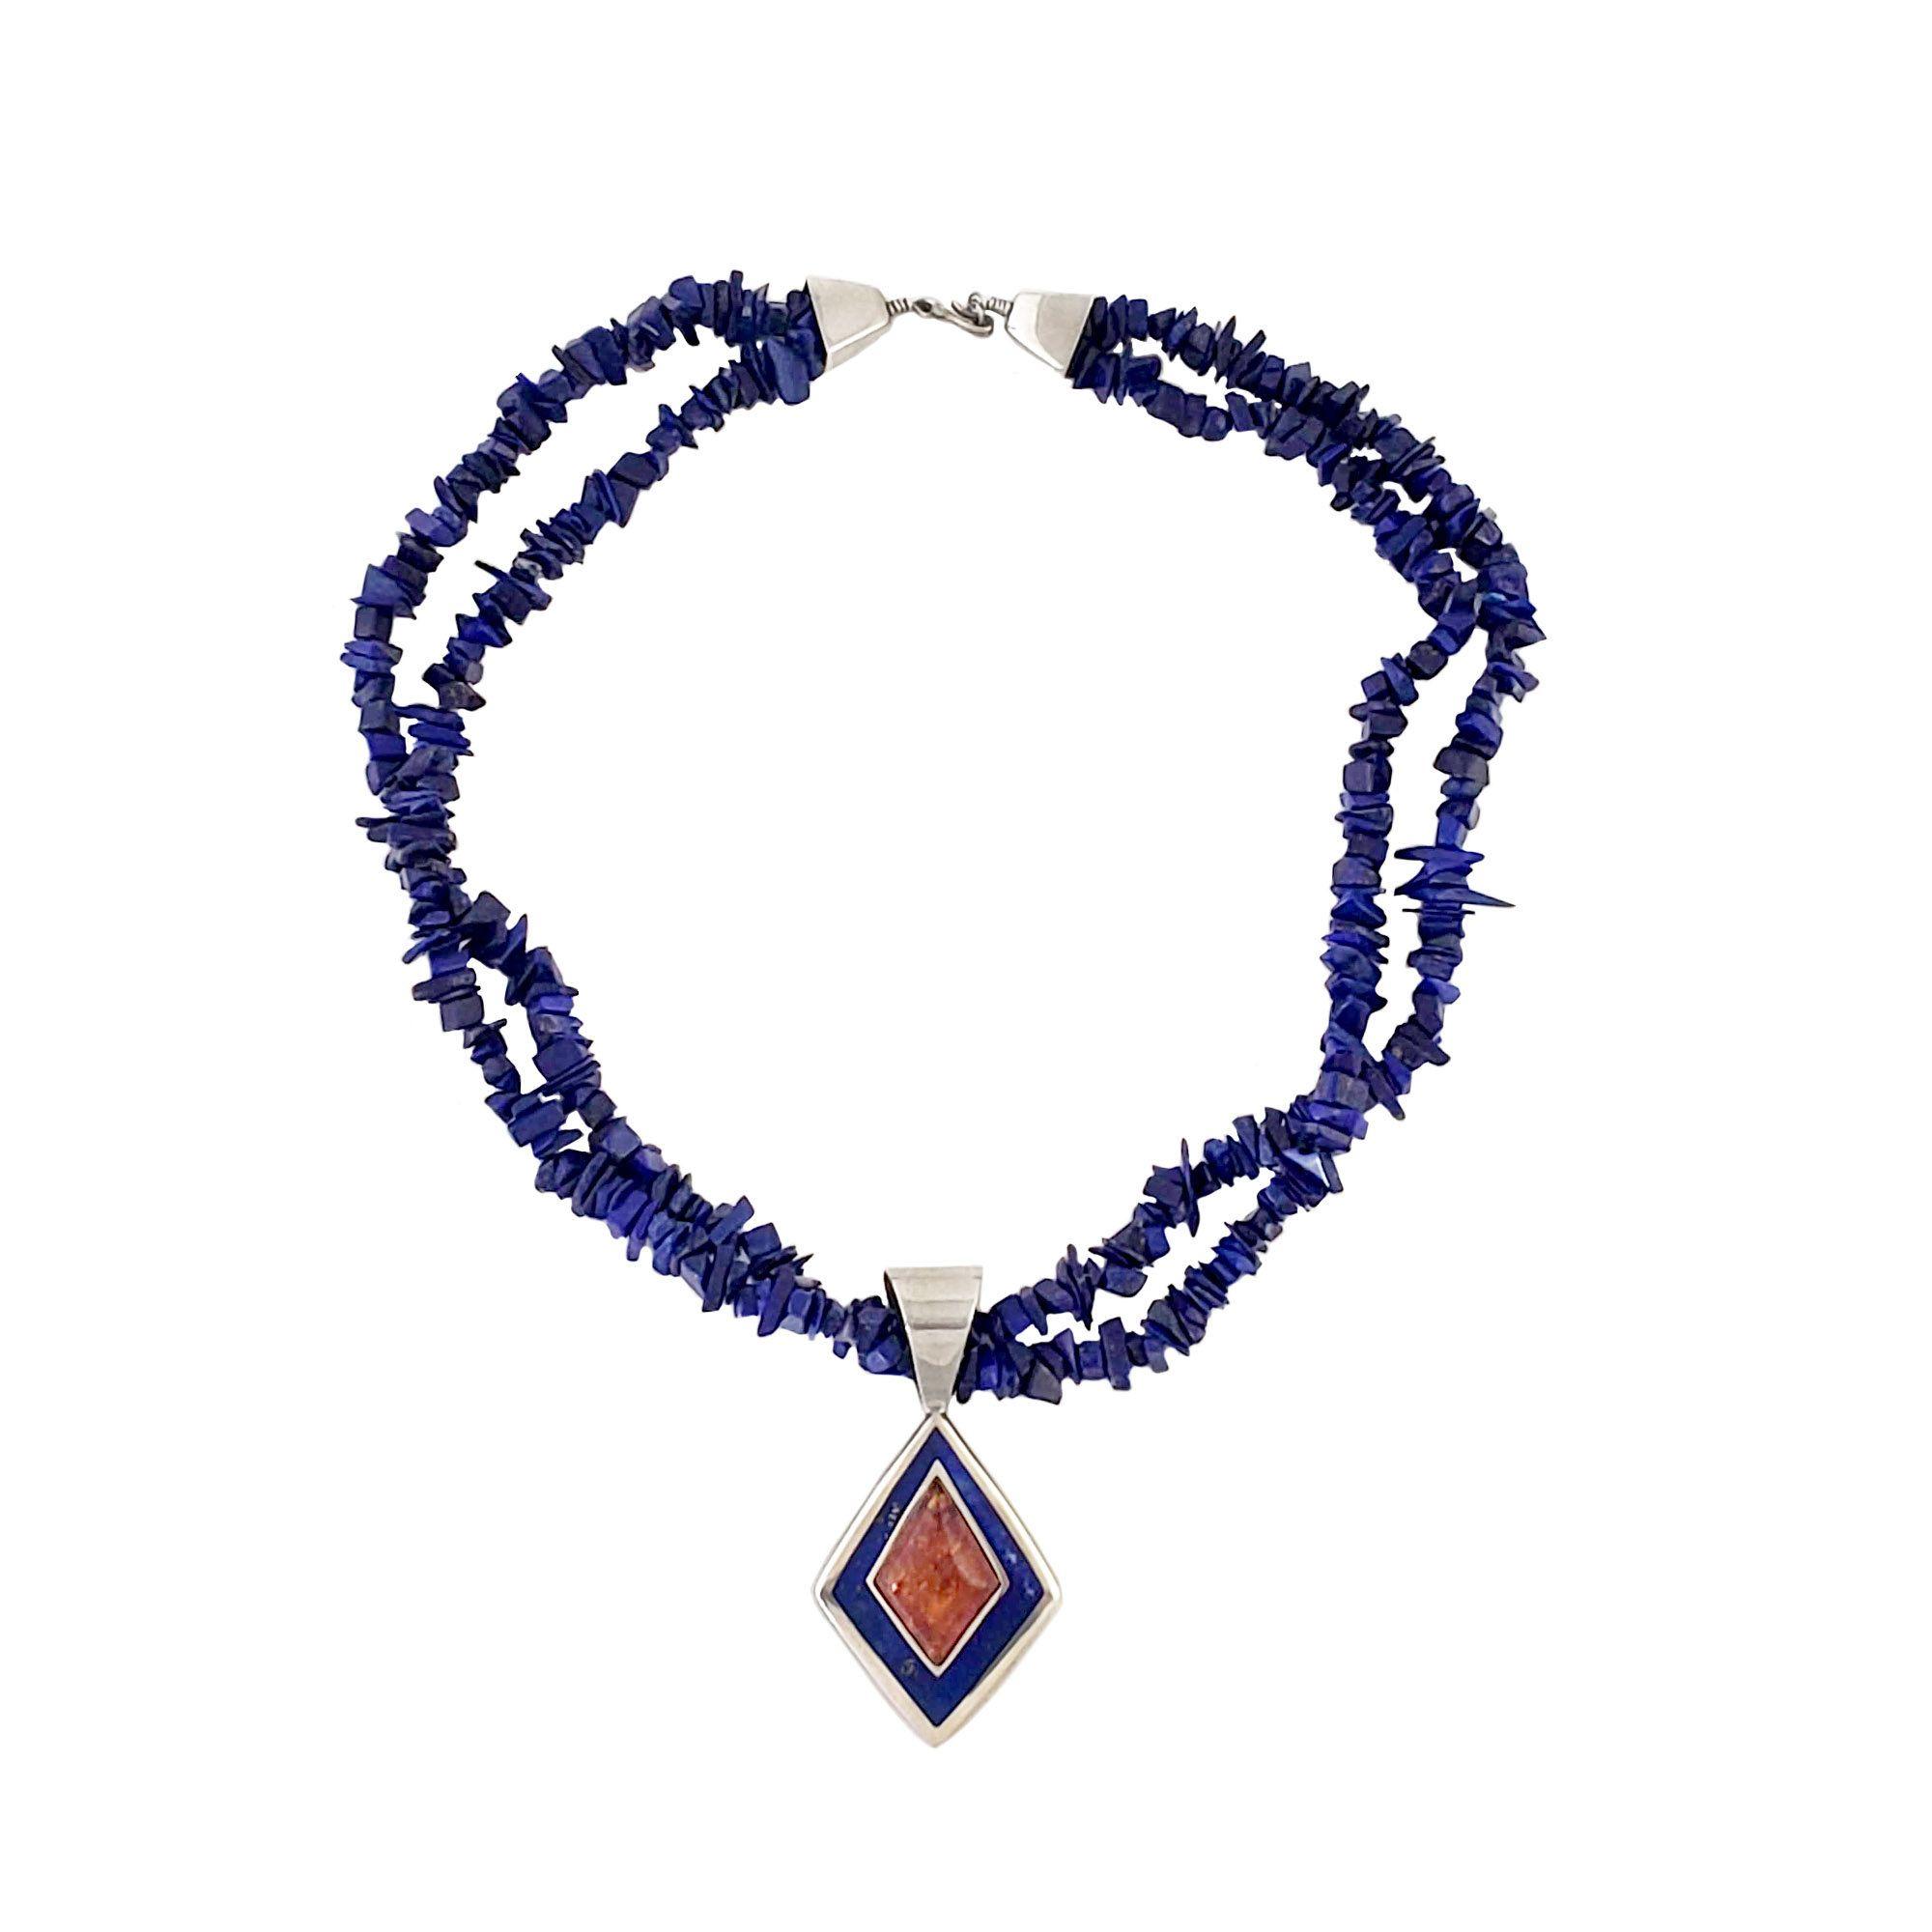 Natural Lazuli-Lapis /& Amethyst Quartz Silver Overlay Gemstone Jewelry Necklace 16-18/'/' Gorgeous !!